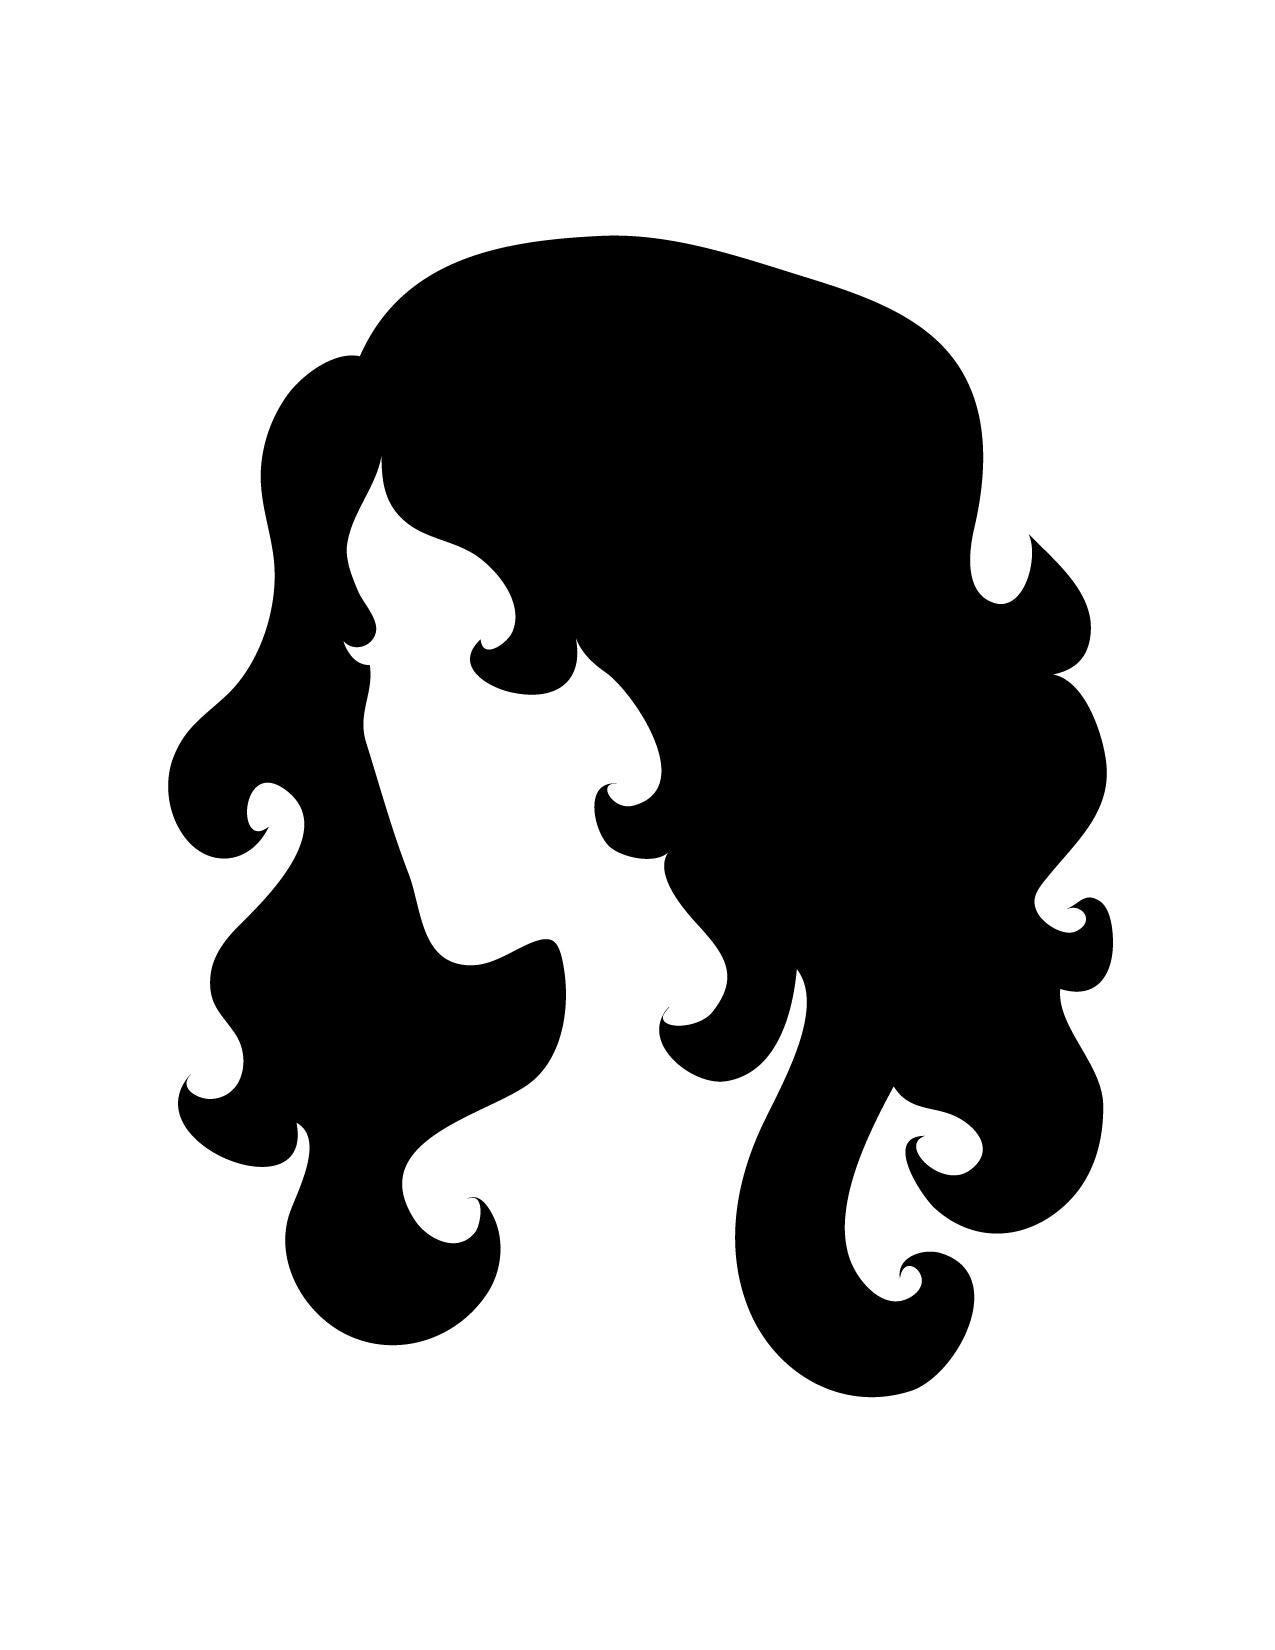 Outline clip art library. Mermaid clipart head